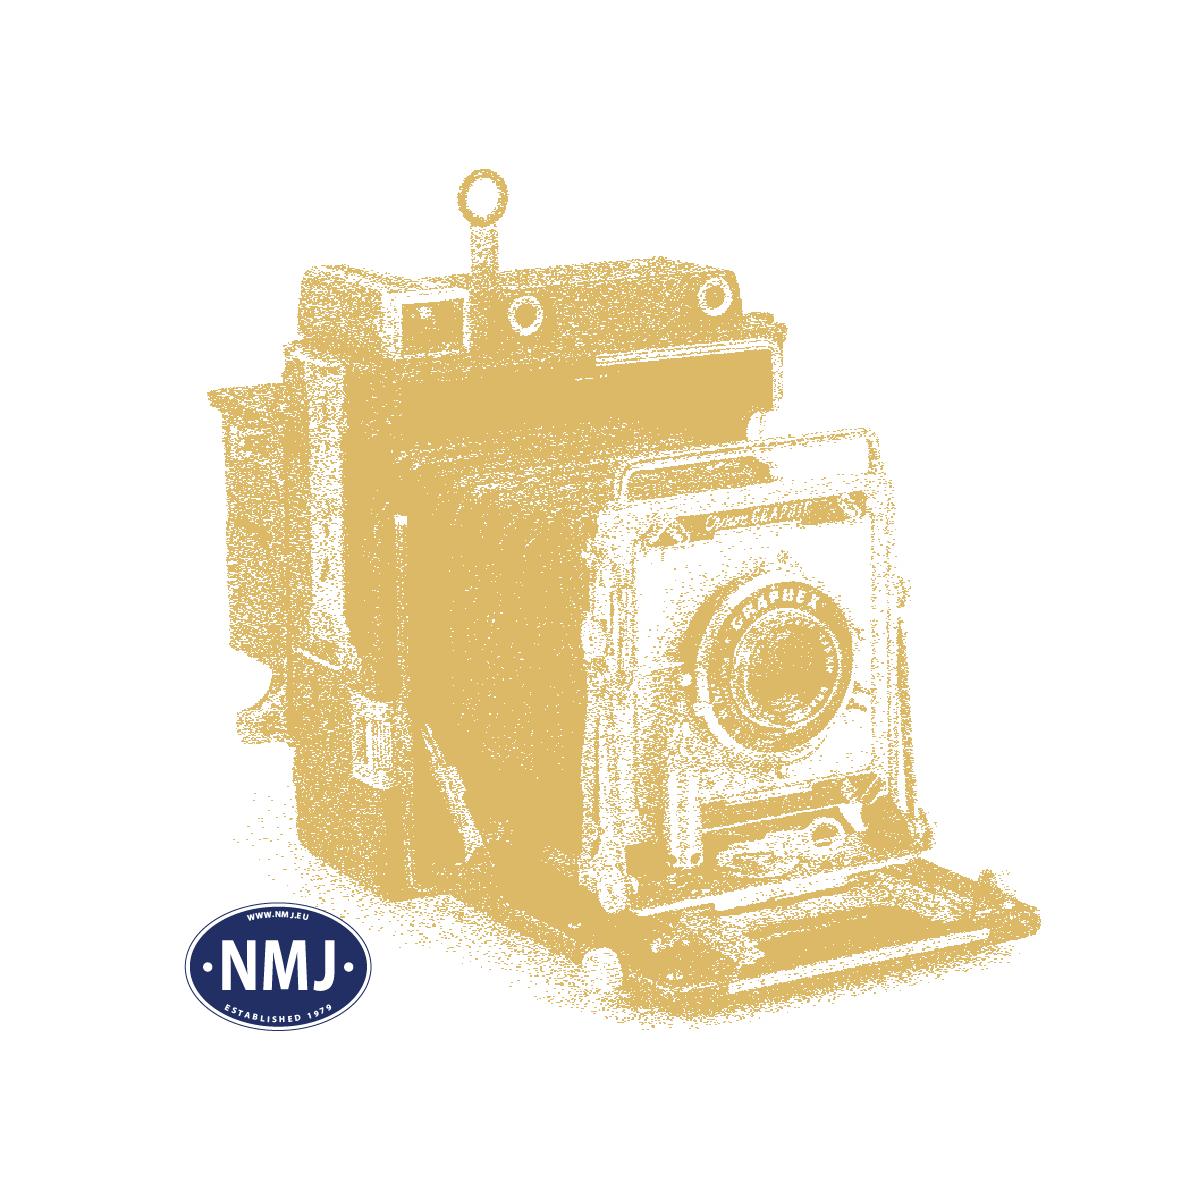 NMJT84.203 - NMJ Topline NSB BM69A.06, DC